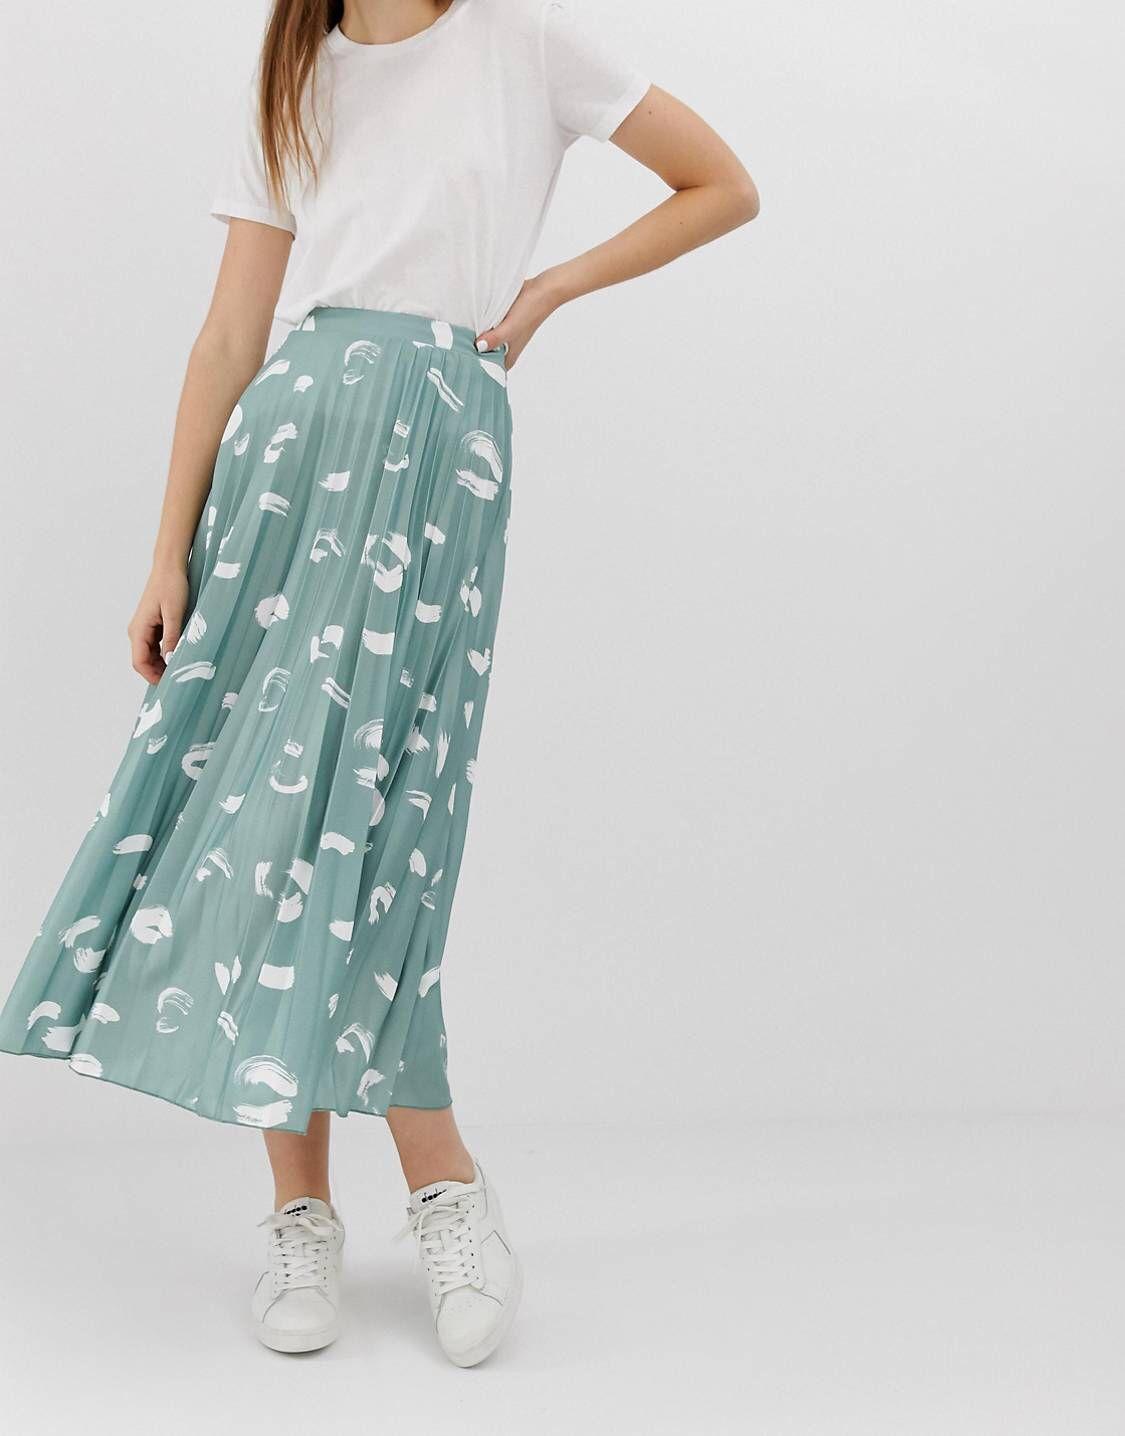 39b48f805c DESIGN pleated midi skirt in brush stroke print in 2019 | Wear it ...